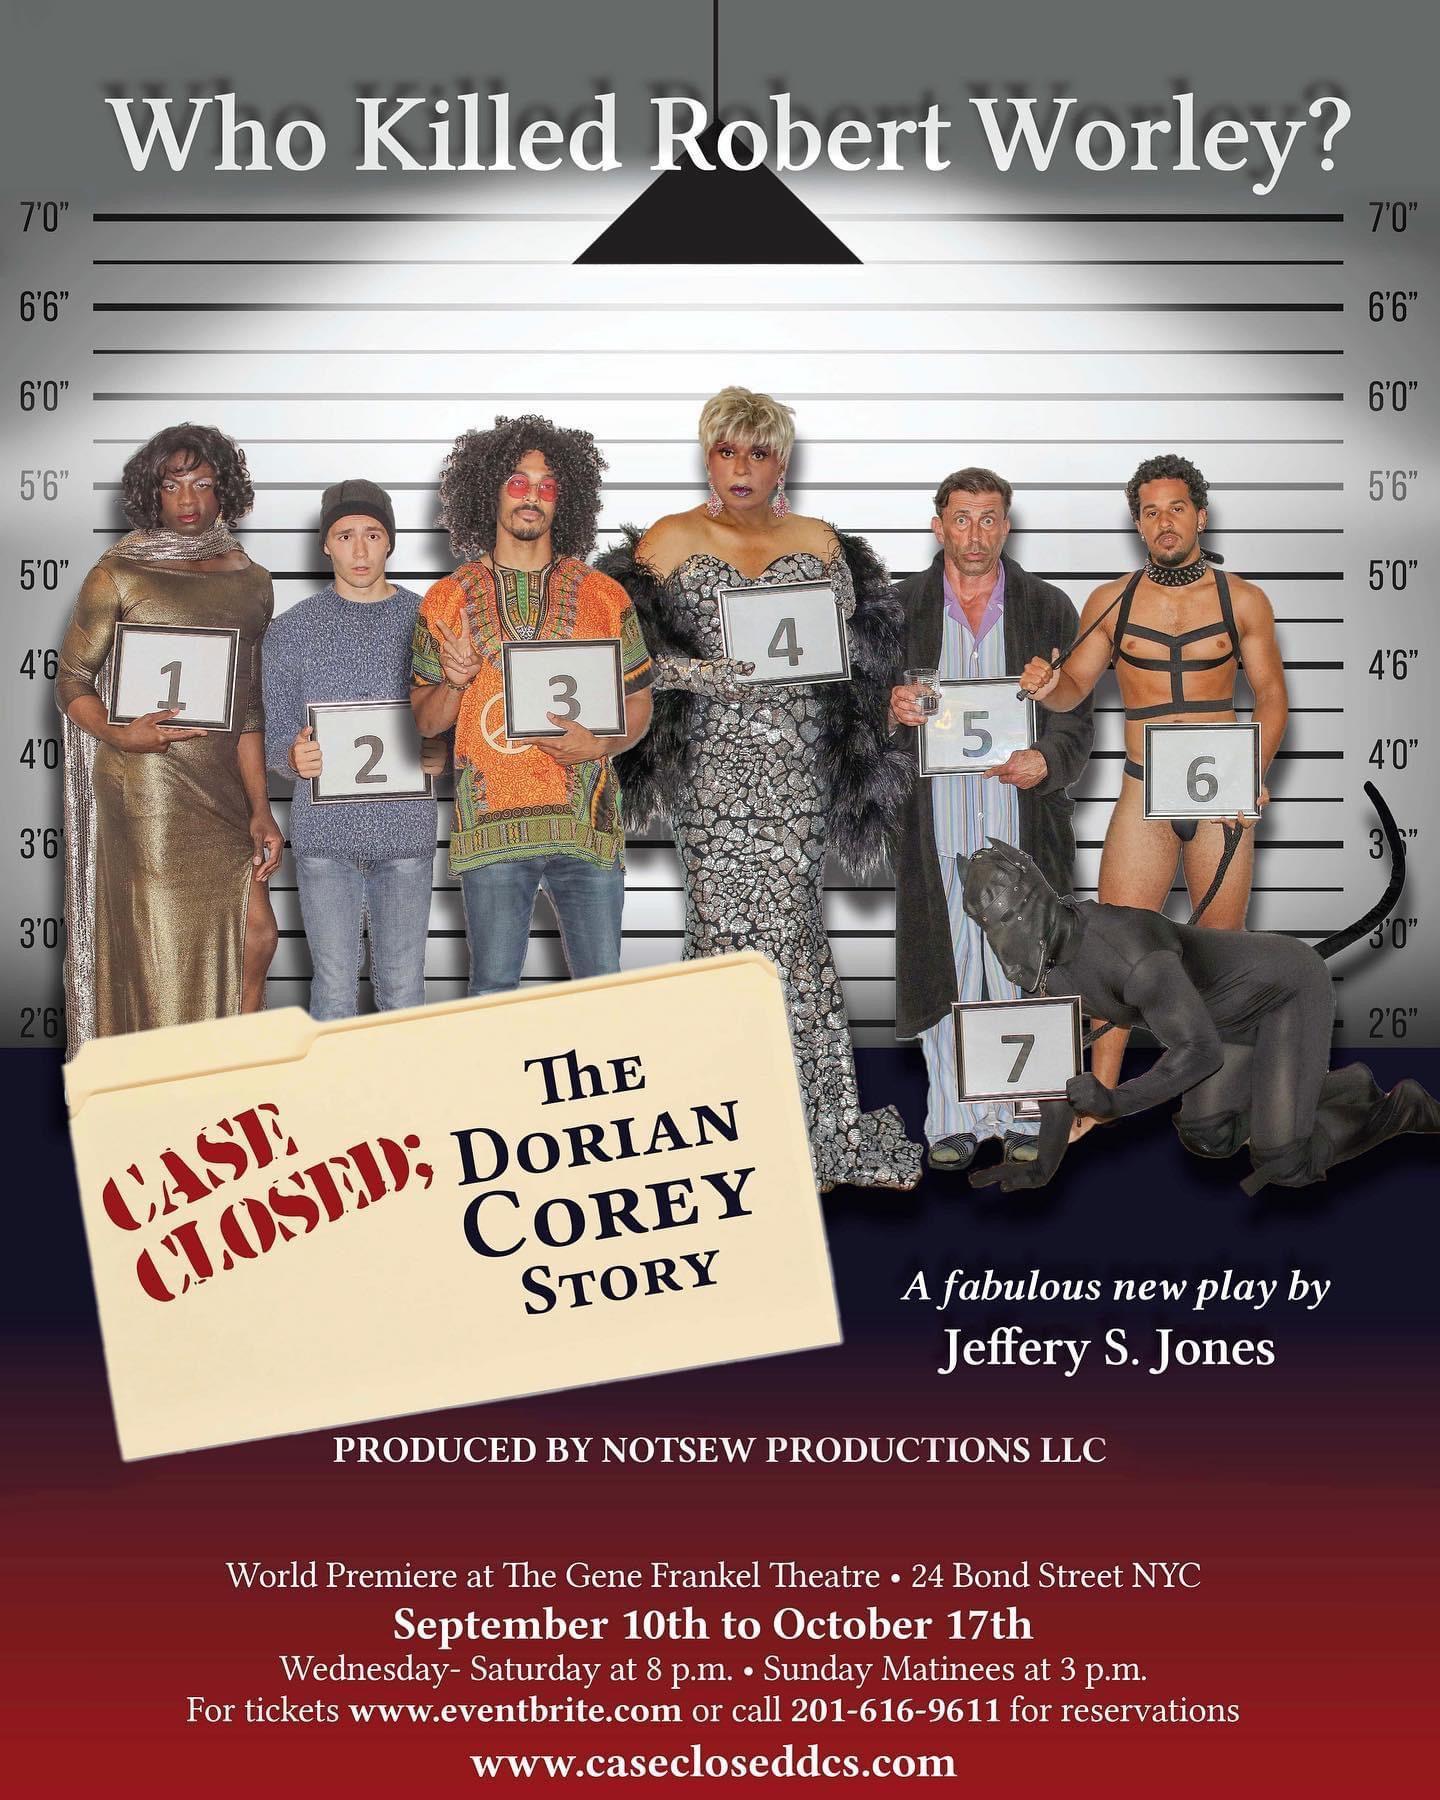 Case Closed: The Dorian Corey Story